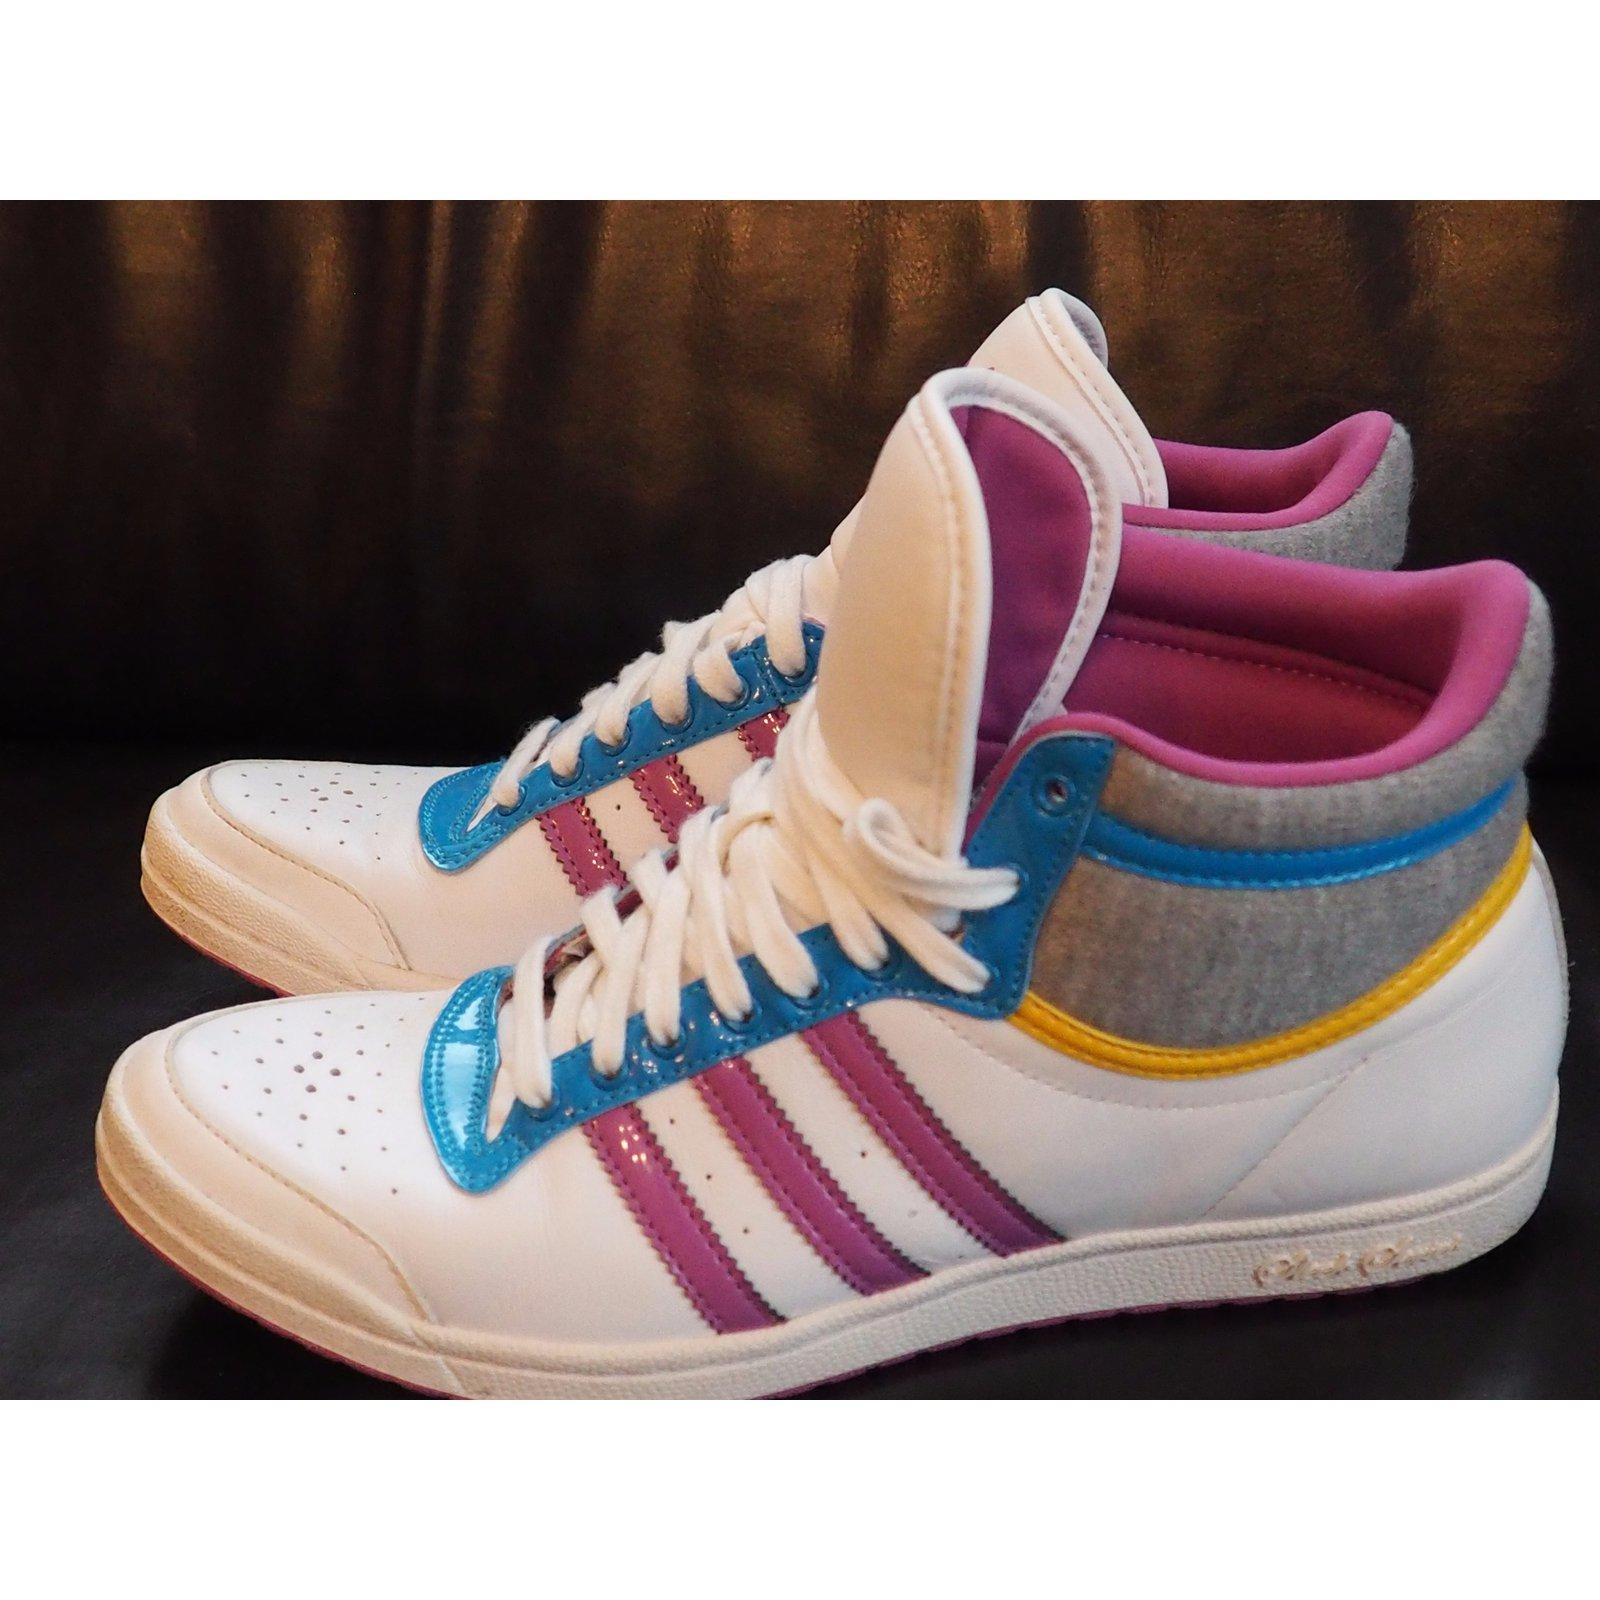 Adidas Sleek Sneakers Leather White Series Sneakers ref thQrsd